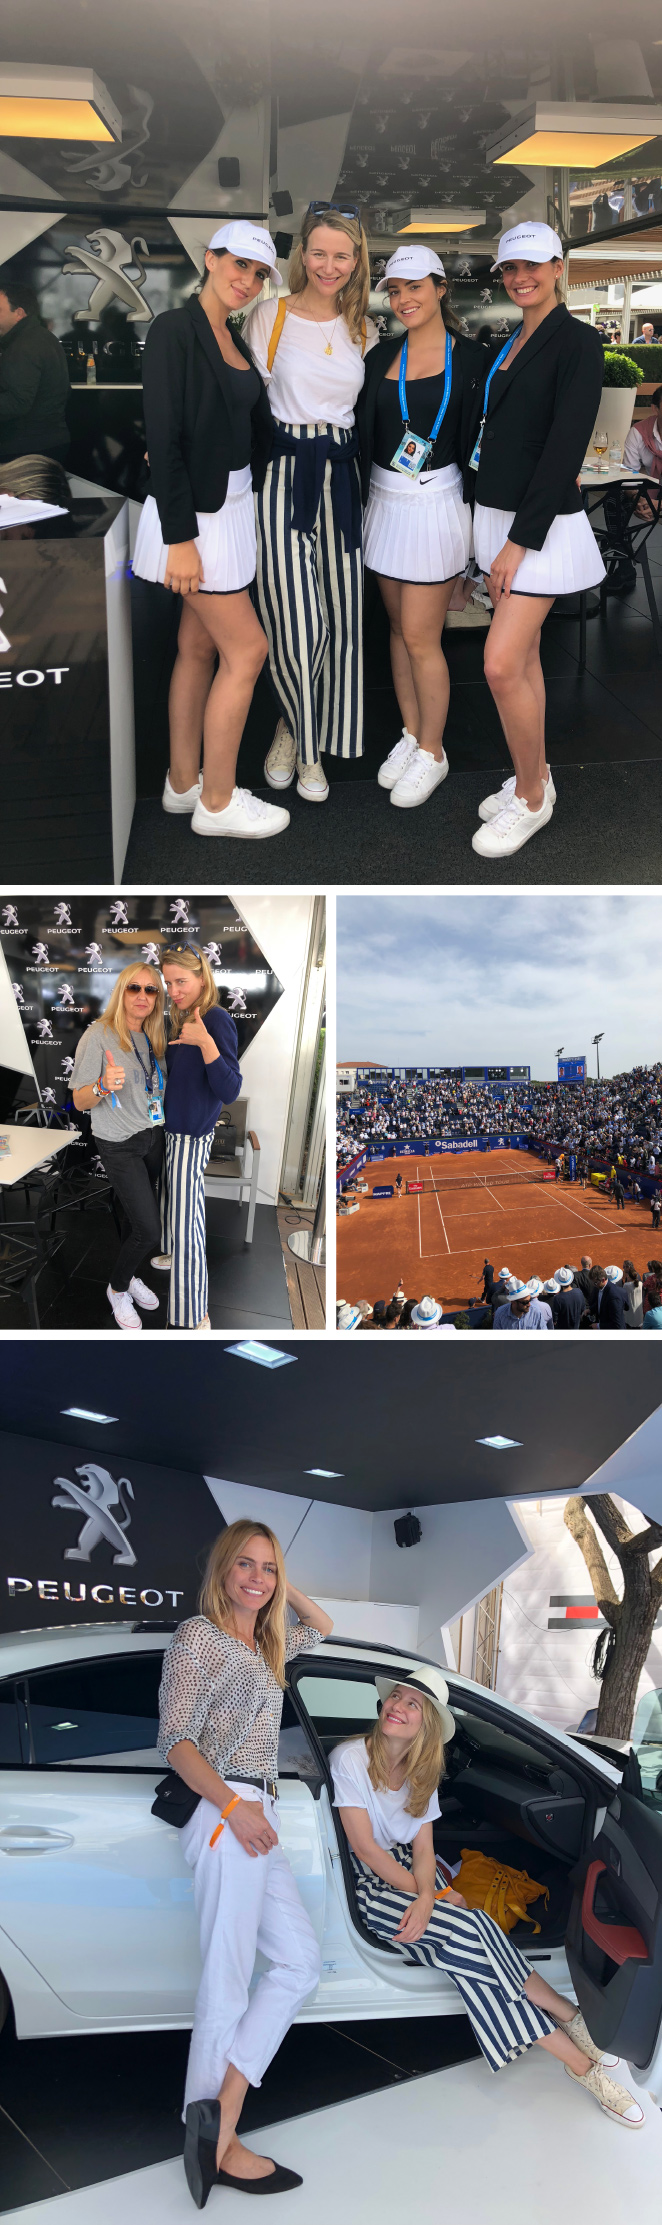 Torneo de Tenis Conde de Godó